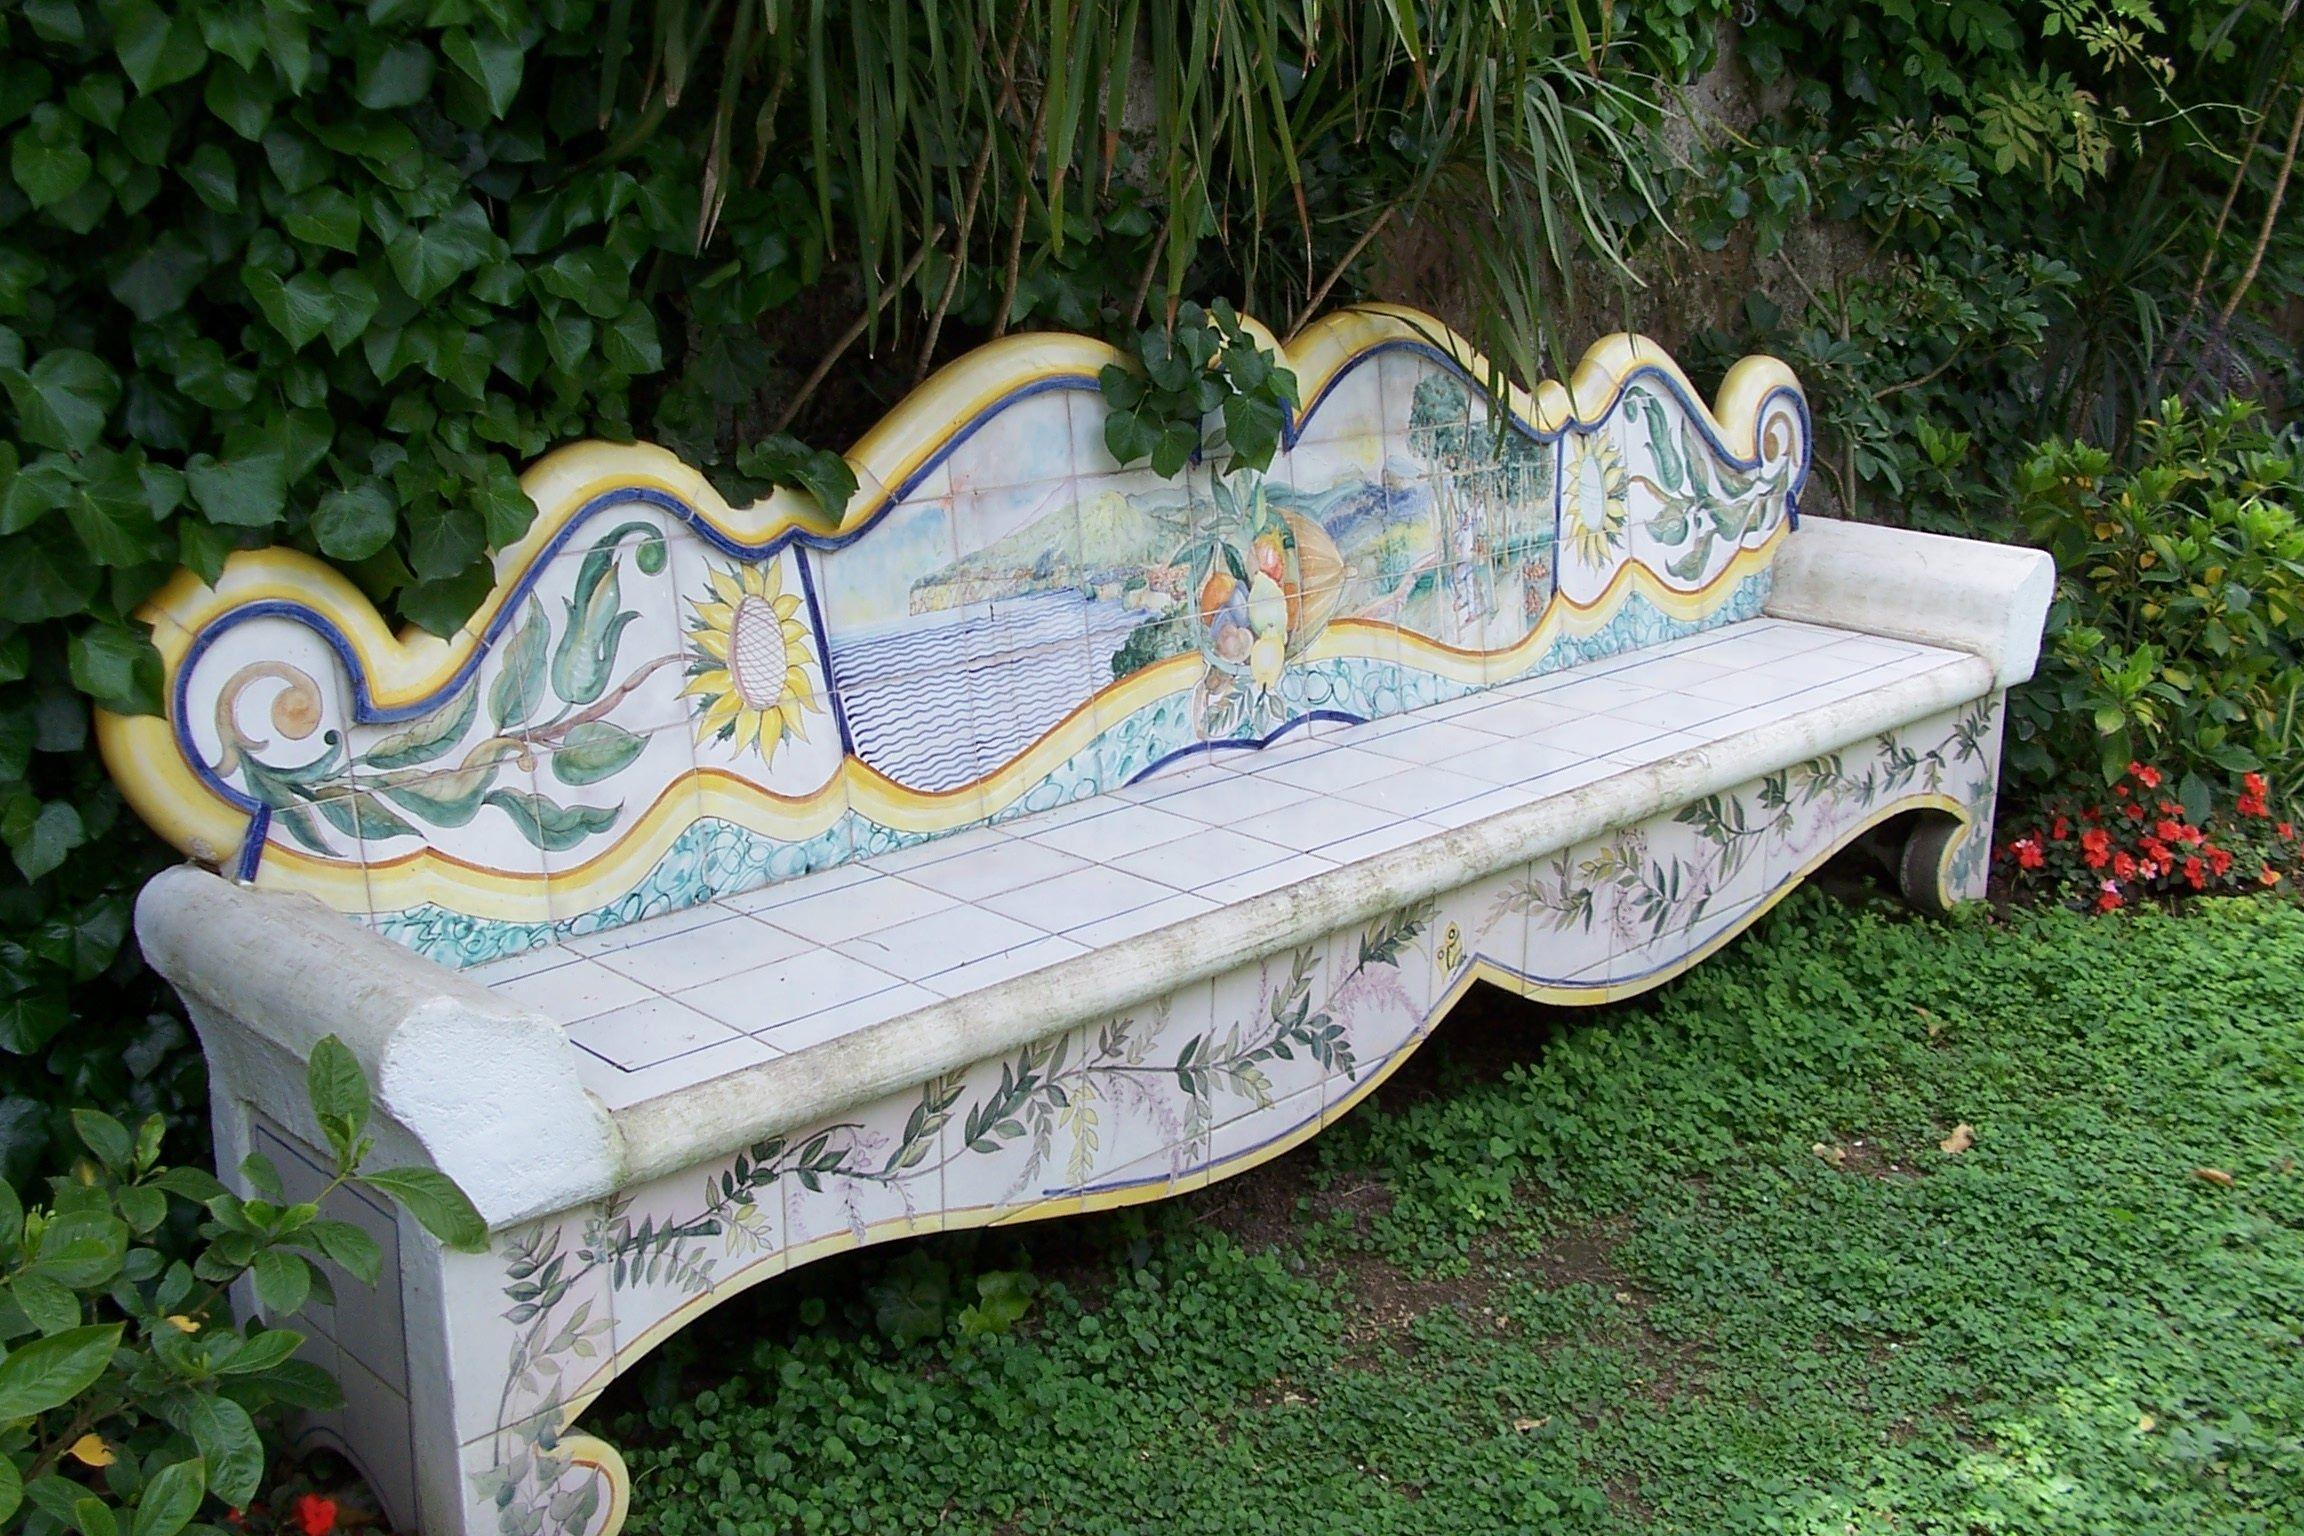 Tremendous Ceramic Bench Sorrento Italian Ceramics Gardening Spiritservingveterans Wood Chair Design Ideas Spiritservingveteransorg